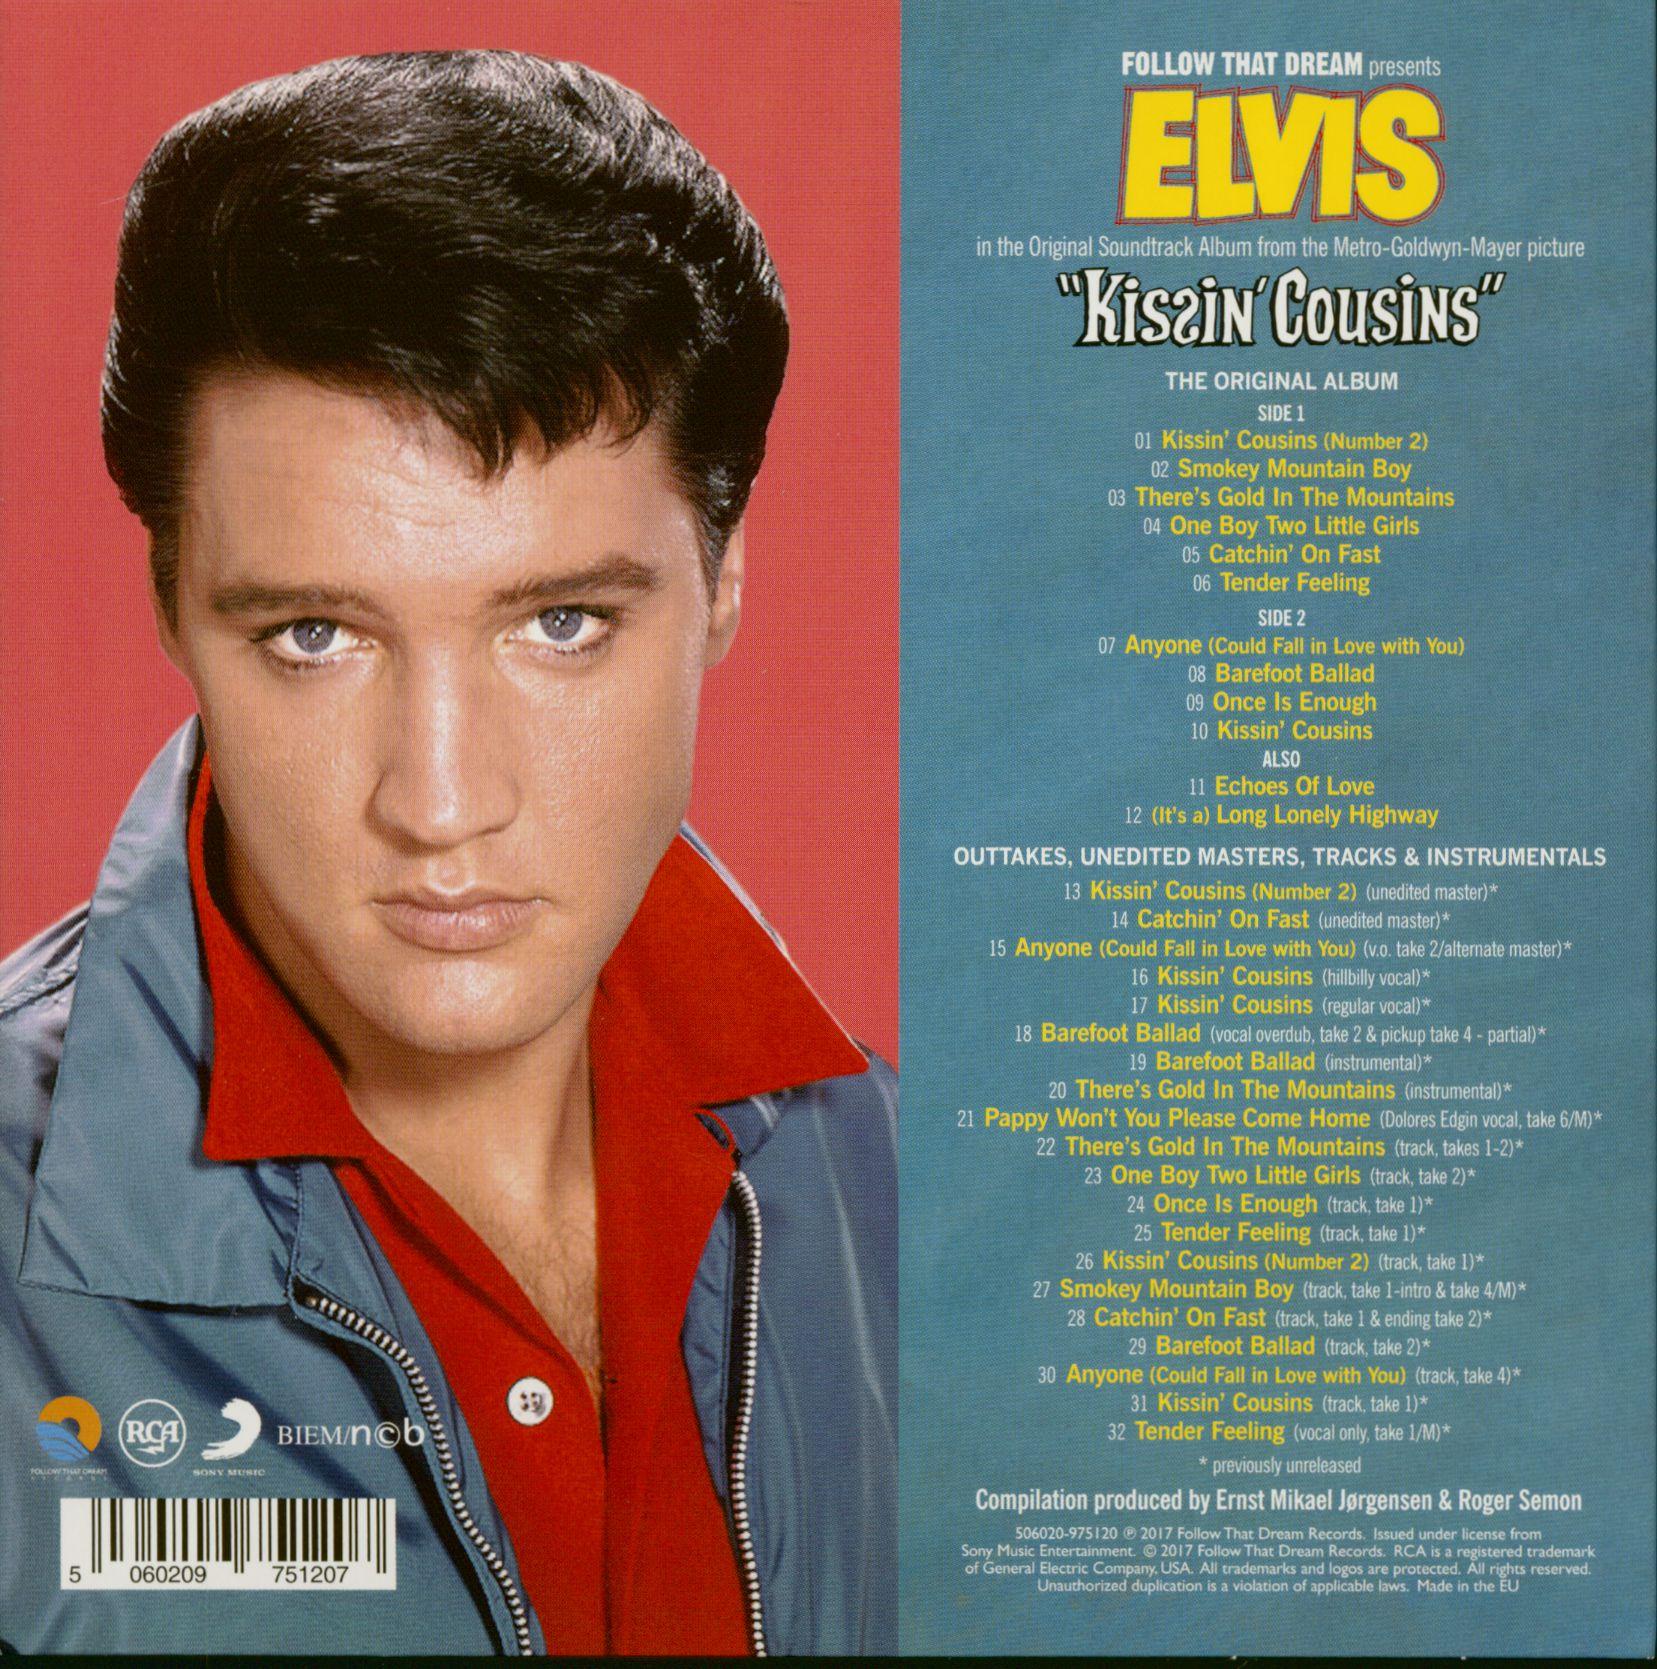 Elvis Presley Kissin' Cousins (CD, 7inch Deluxe Packaging)